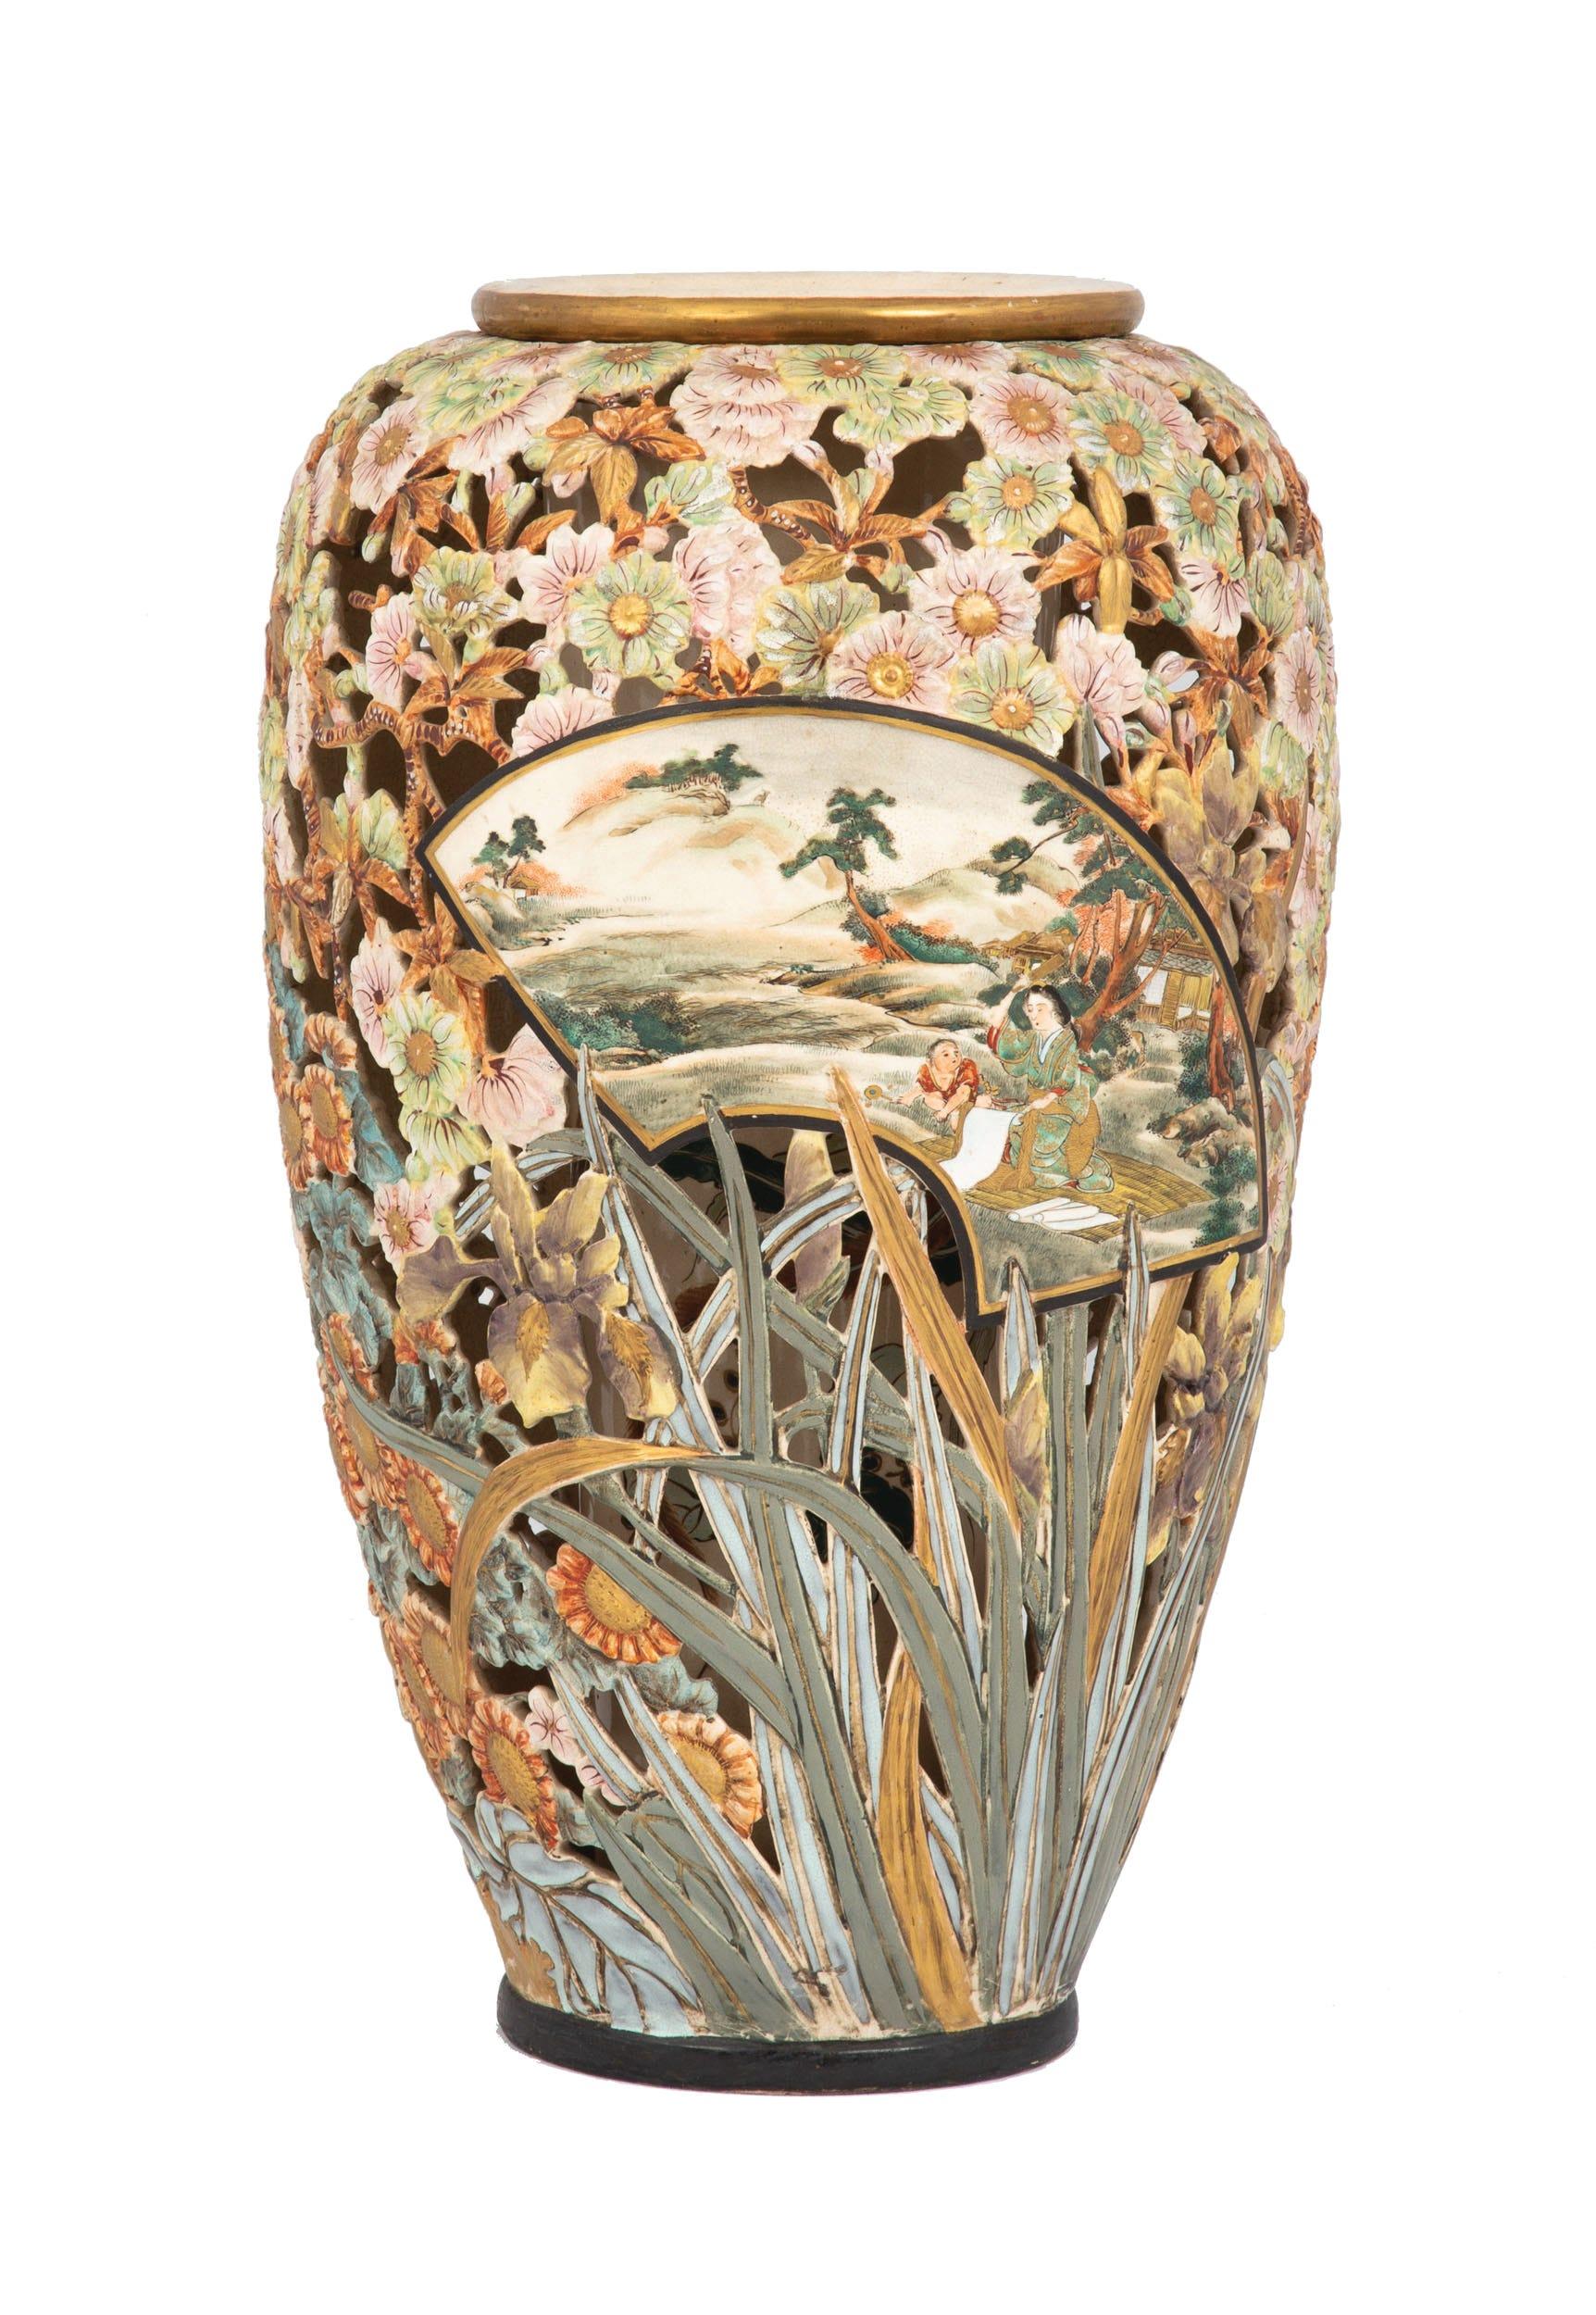 Pottery vintage satsuma Satsuma Vase